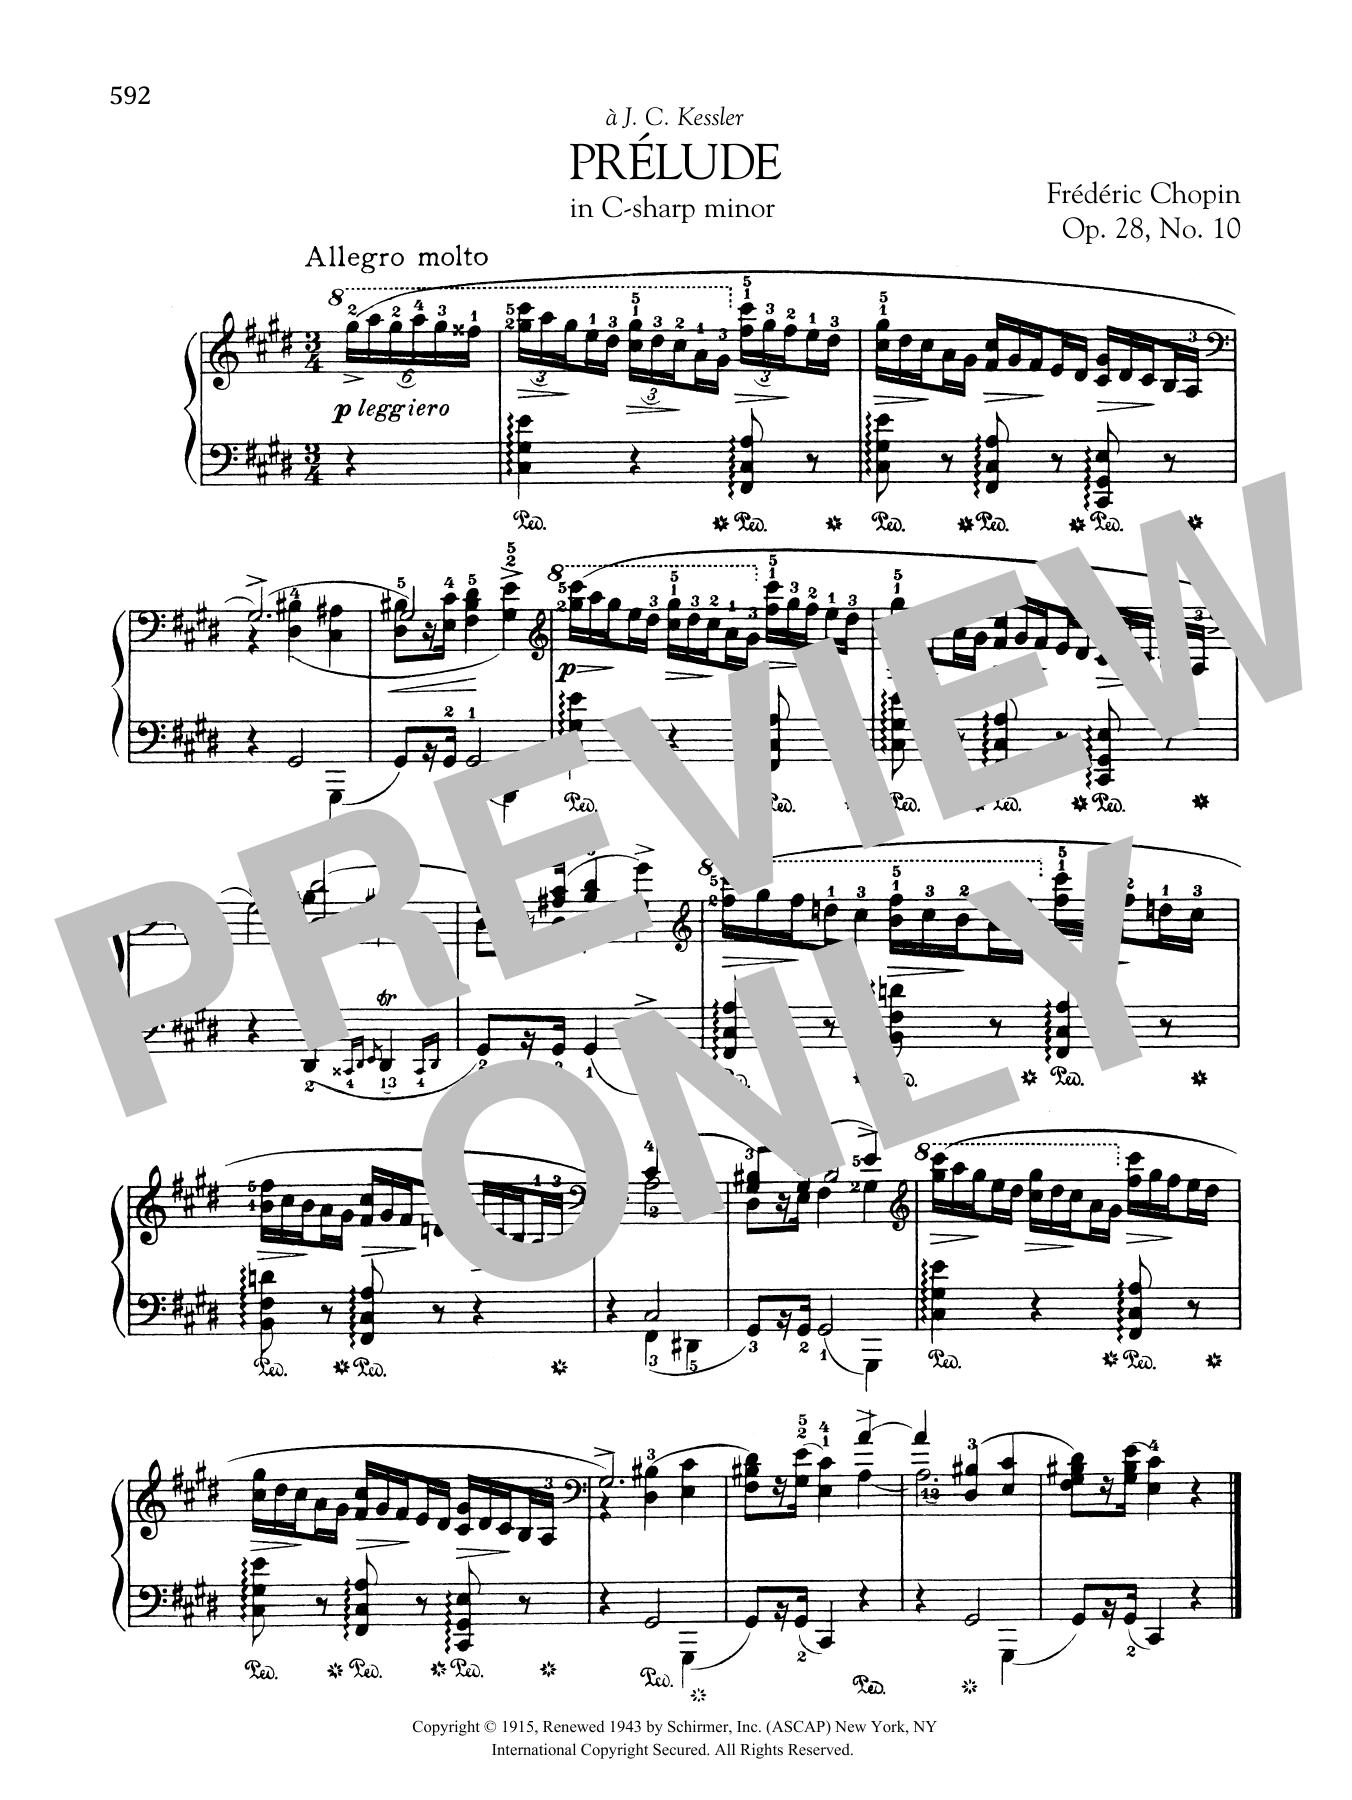 Prélude in C-sharp minor, Op. 28, No. 10